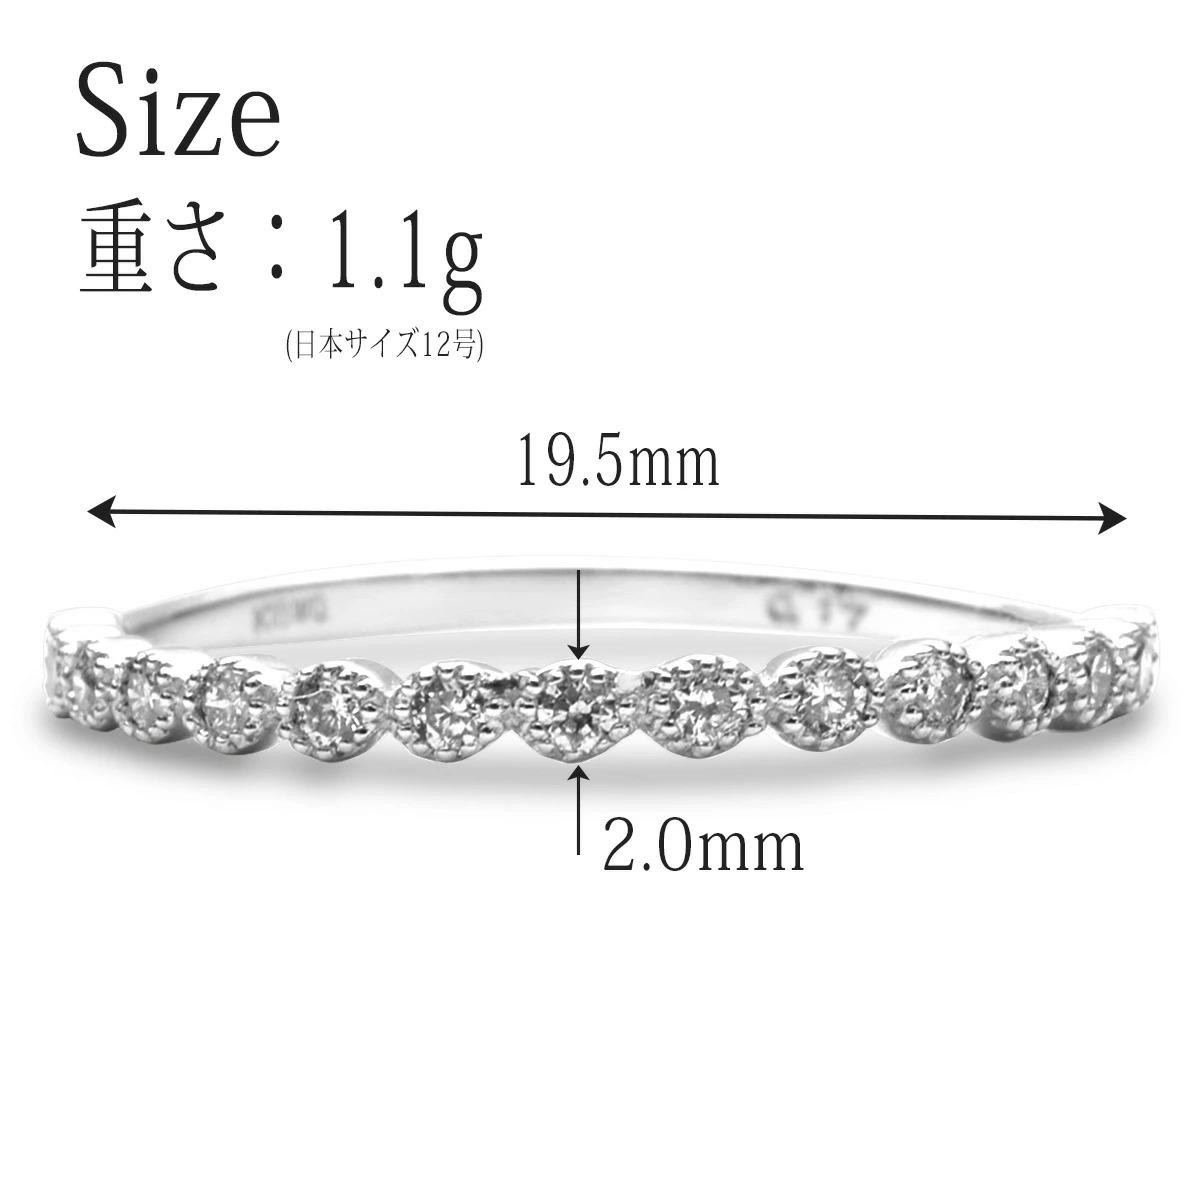 Pt900 プラチナ リング 指輪 ホワイトダイヤモンド ミルグレイン リング RERALUy rri1656pt 新作